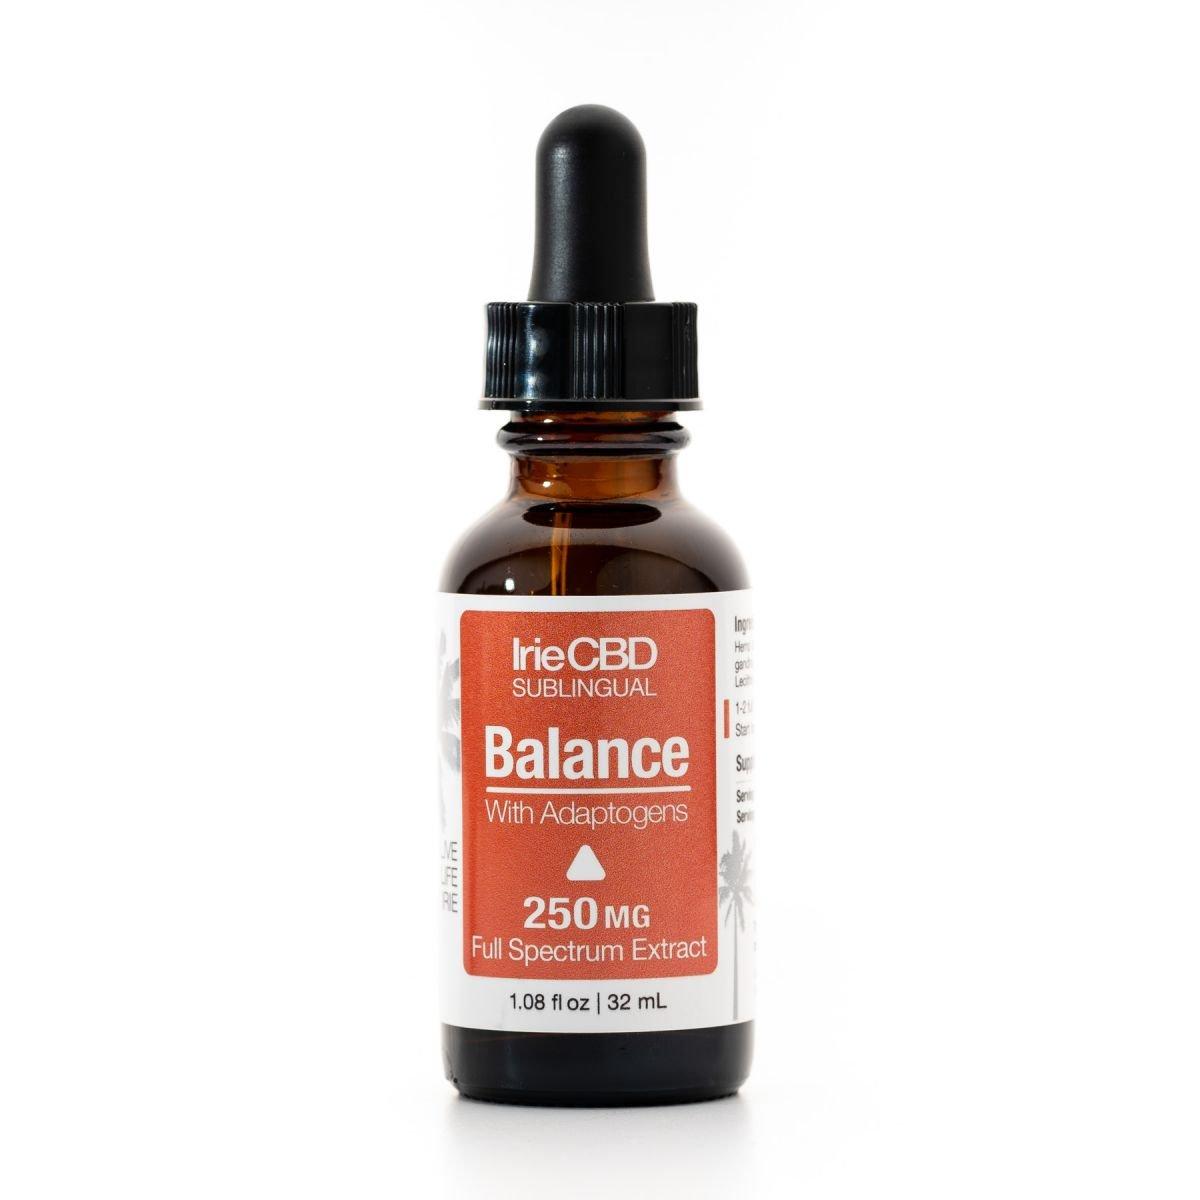 IrieCBD Balance CBD Oil Tincture